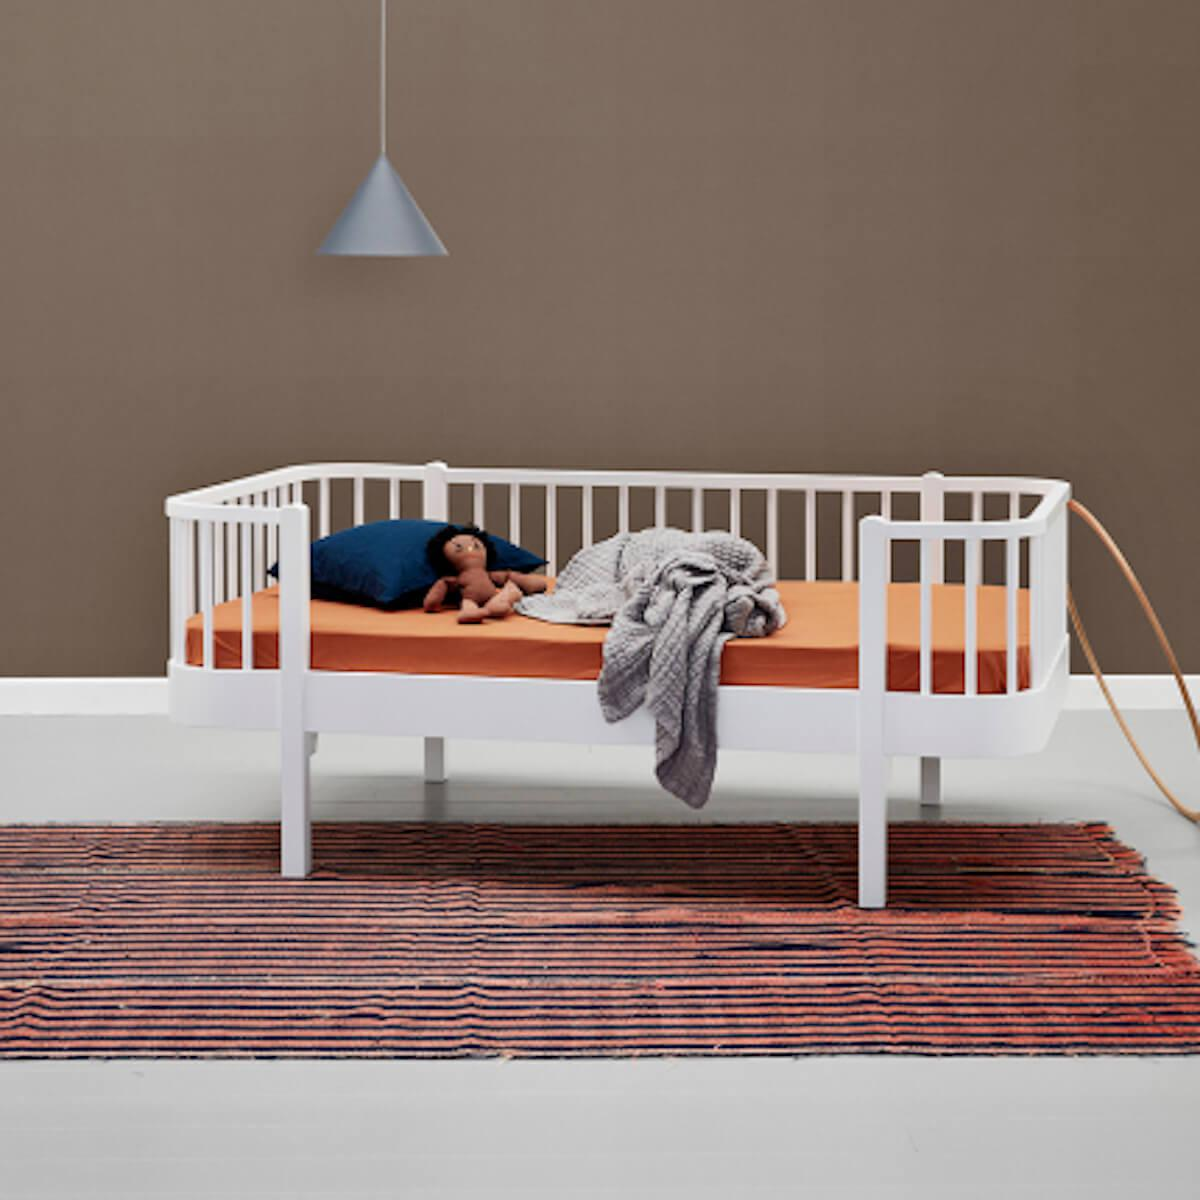 Lit banquette évolutif 90x160cm WOOD Oliver Furniture blanc